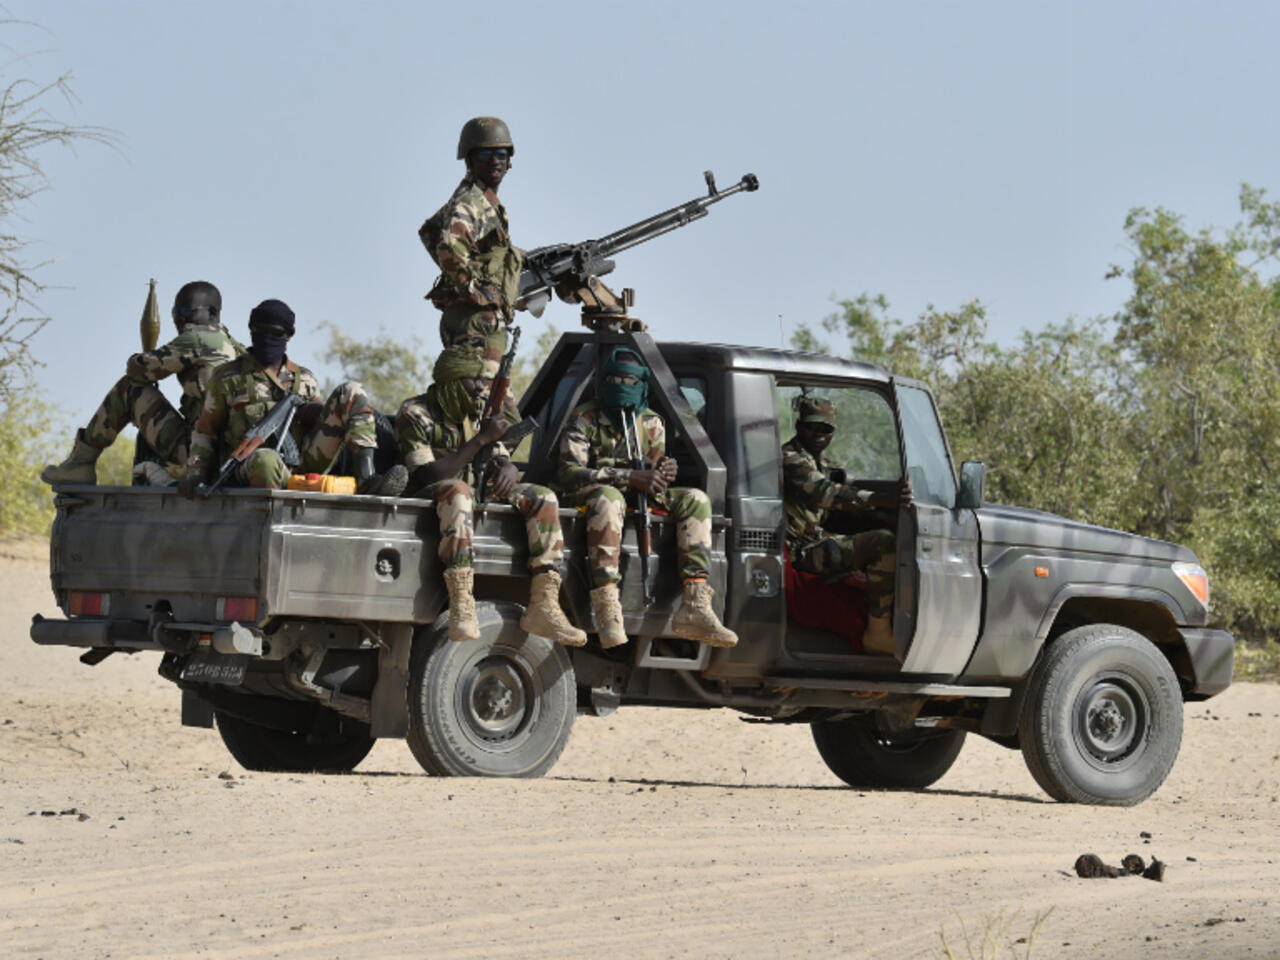 Une trentaine de soldats tués dans une attaque de Boko Haram au Niger